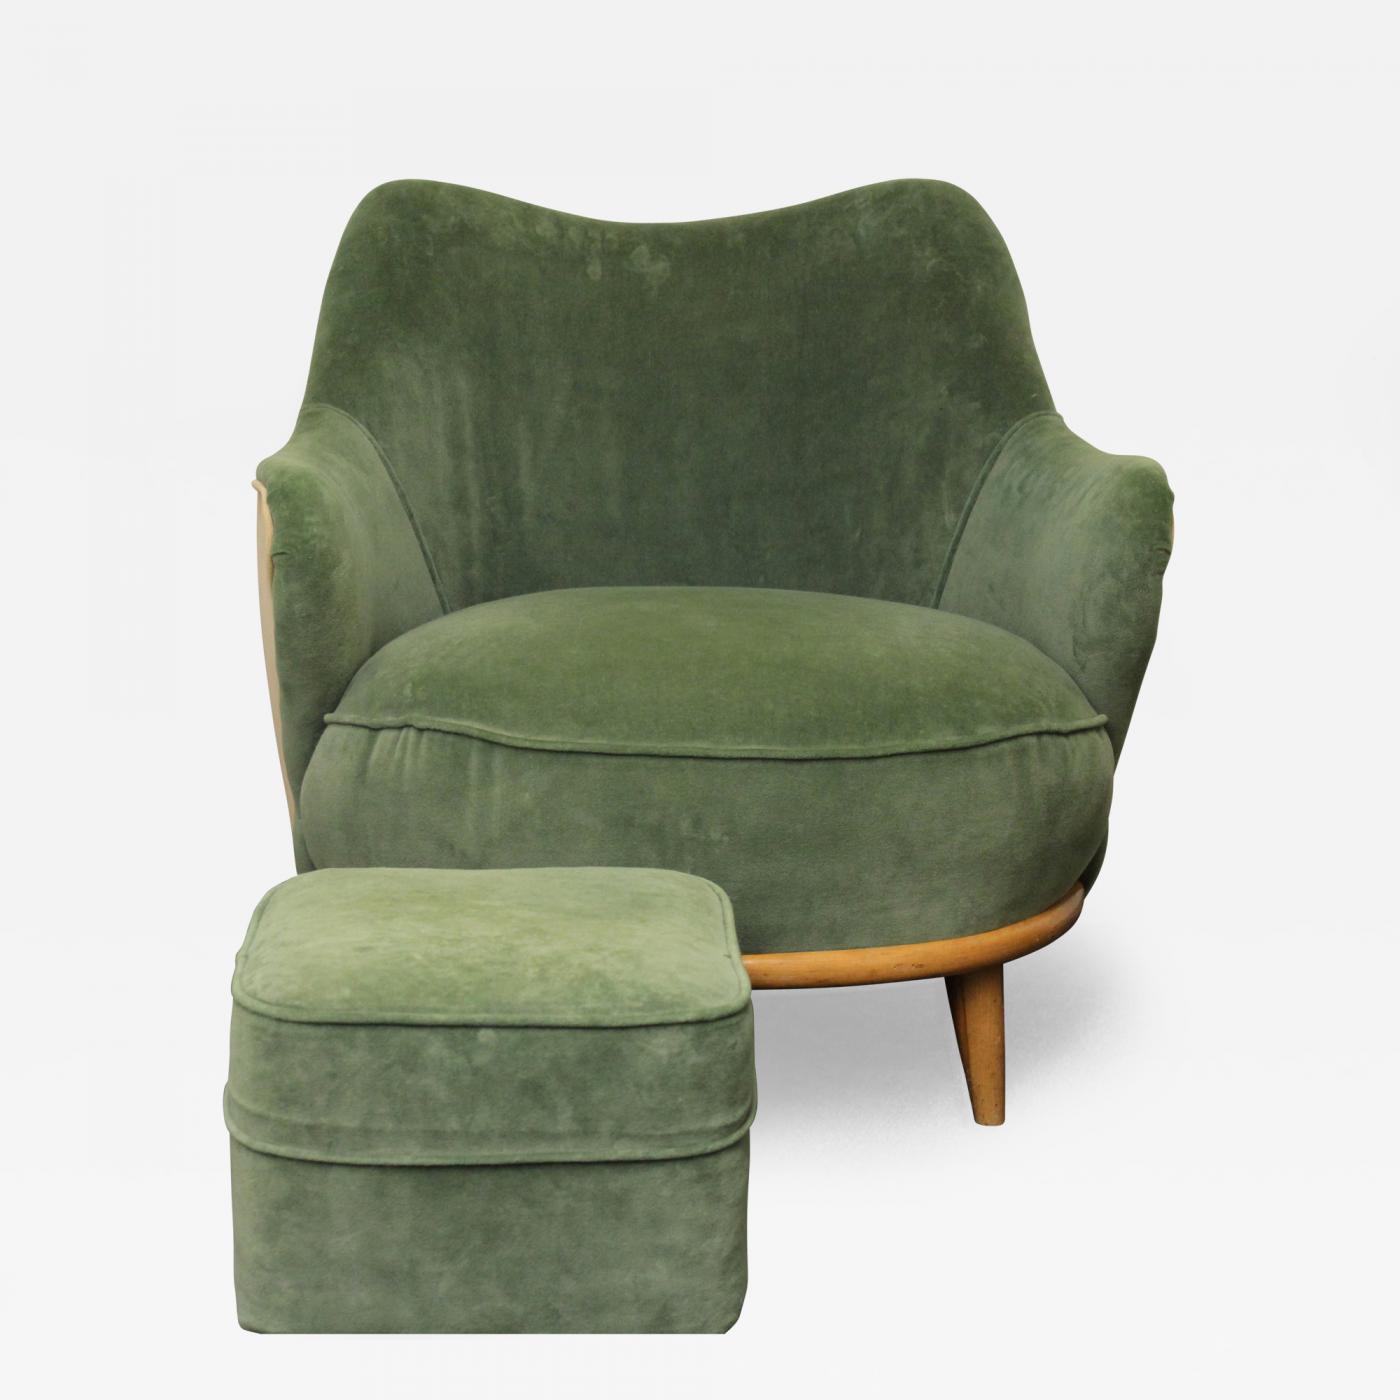 heywood wakefield chairs rocking chair classic heywood-wakefield - tub with ottoman